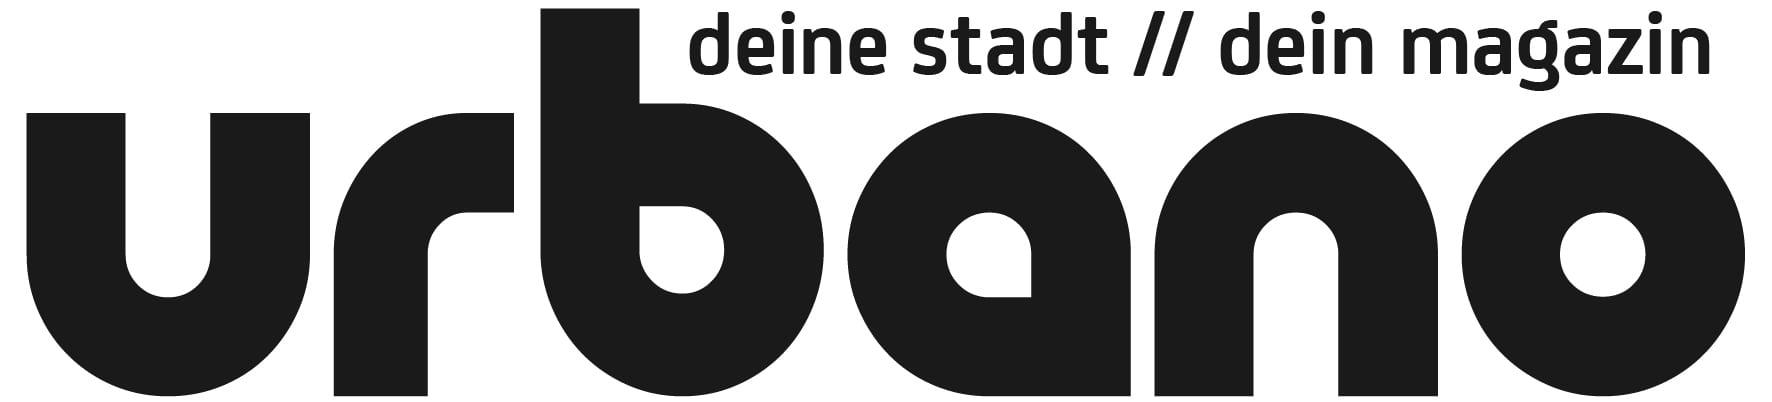 Urbano Mönchengladbach GmbH